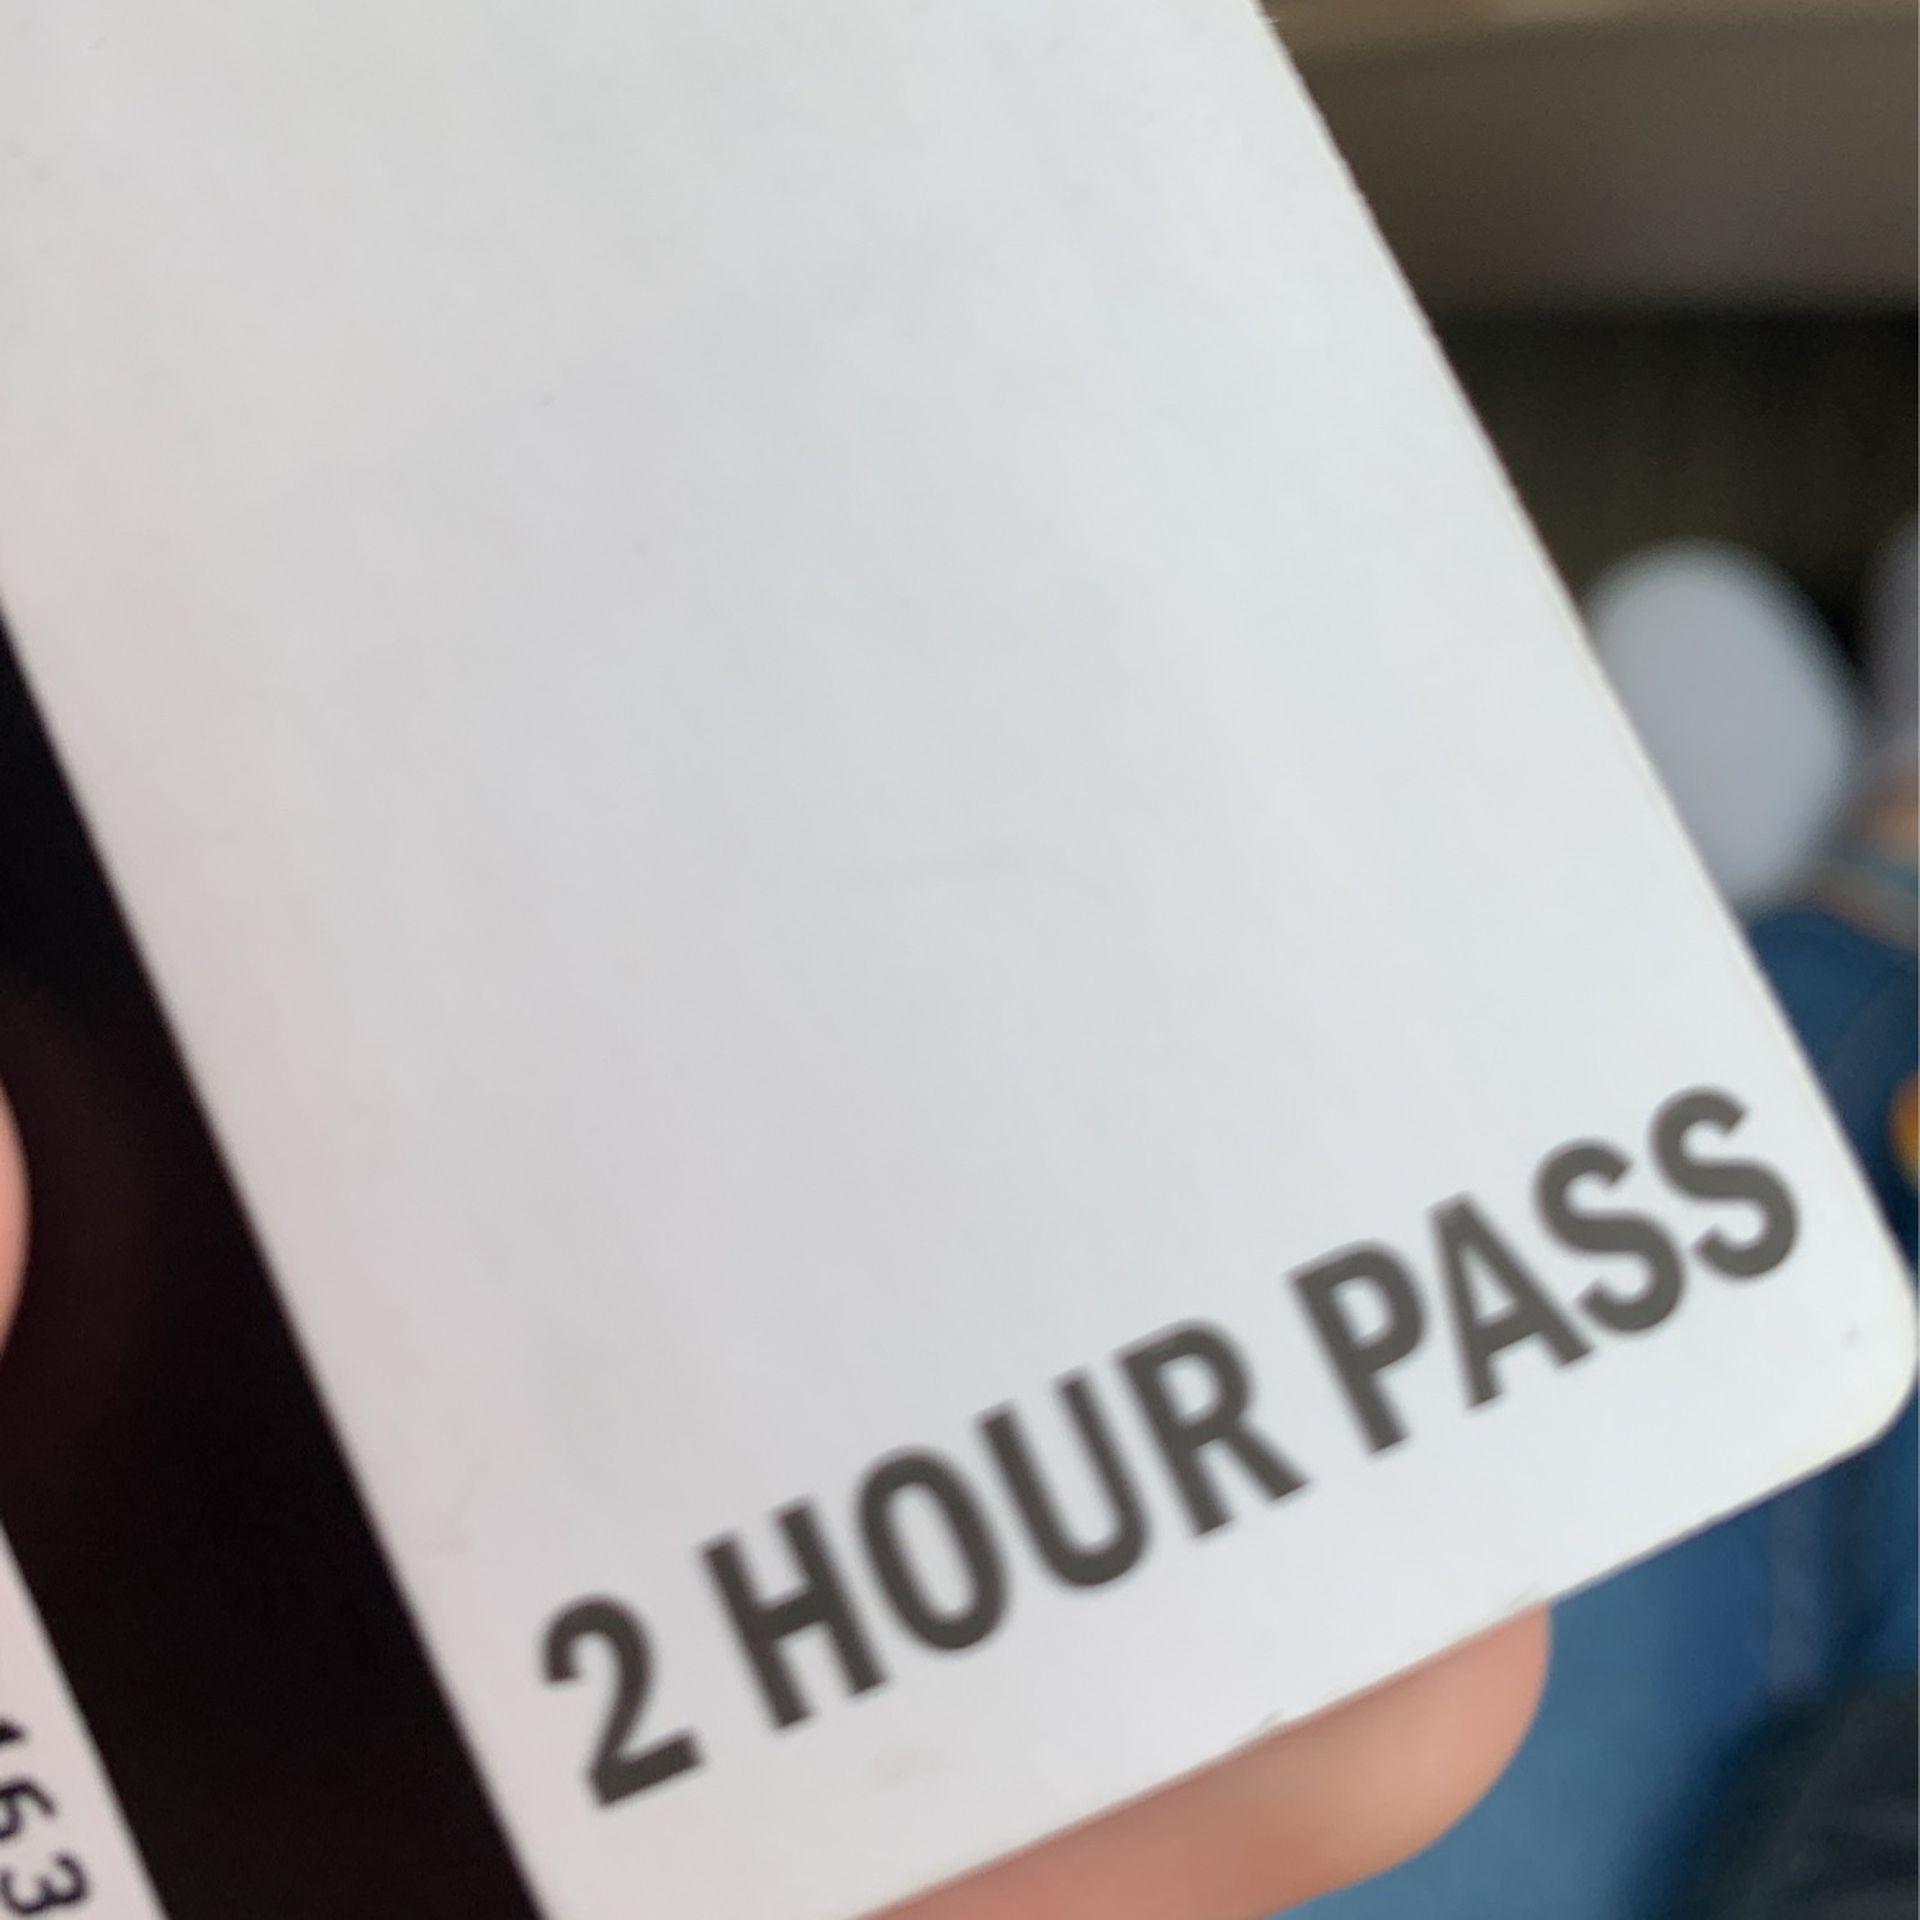 12 Ripta 2 Hour Passes